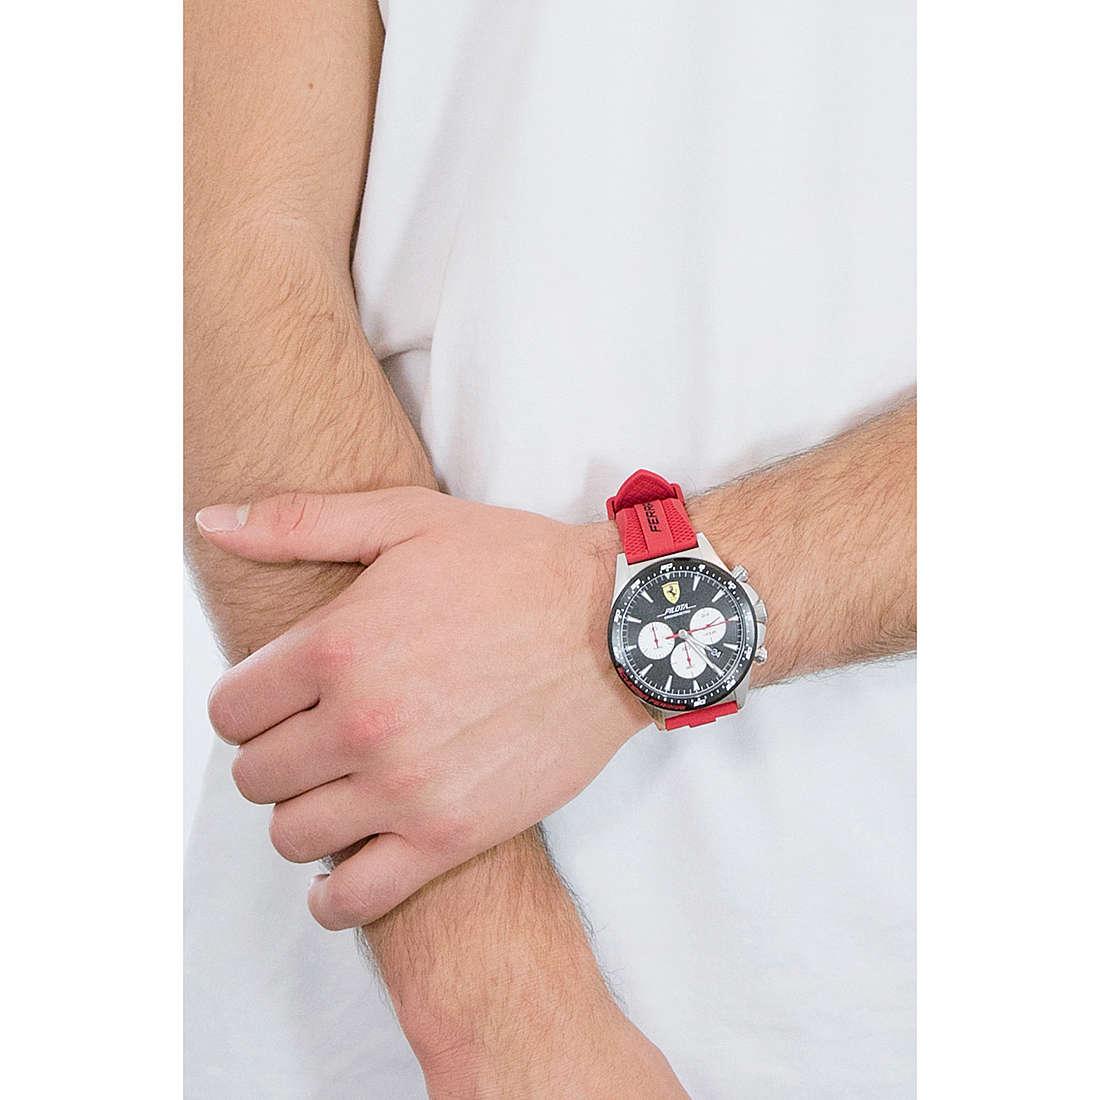 Watch Chronograph Man Scuderia Ferrari Pilota Fer0830596 Chronographs Scuderia Ferrari